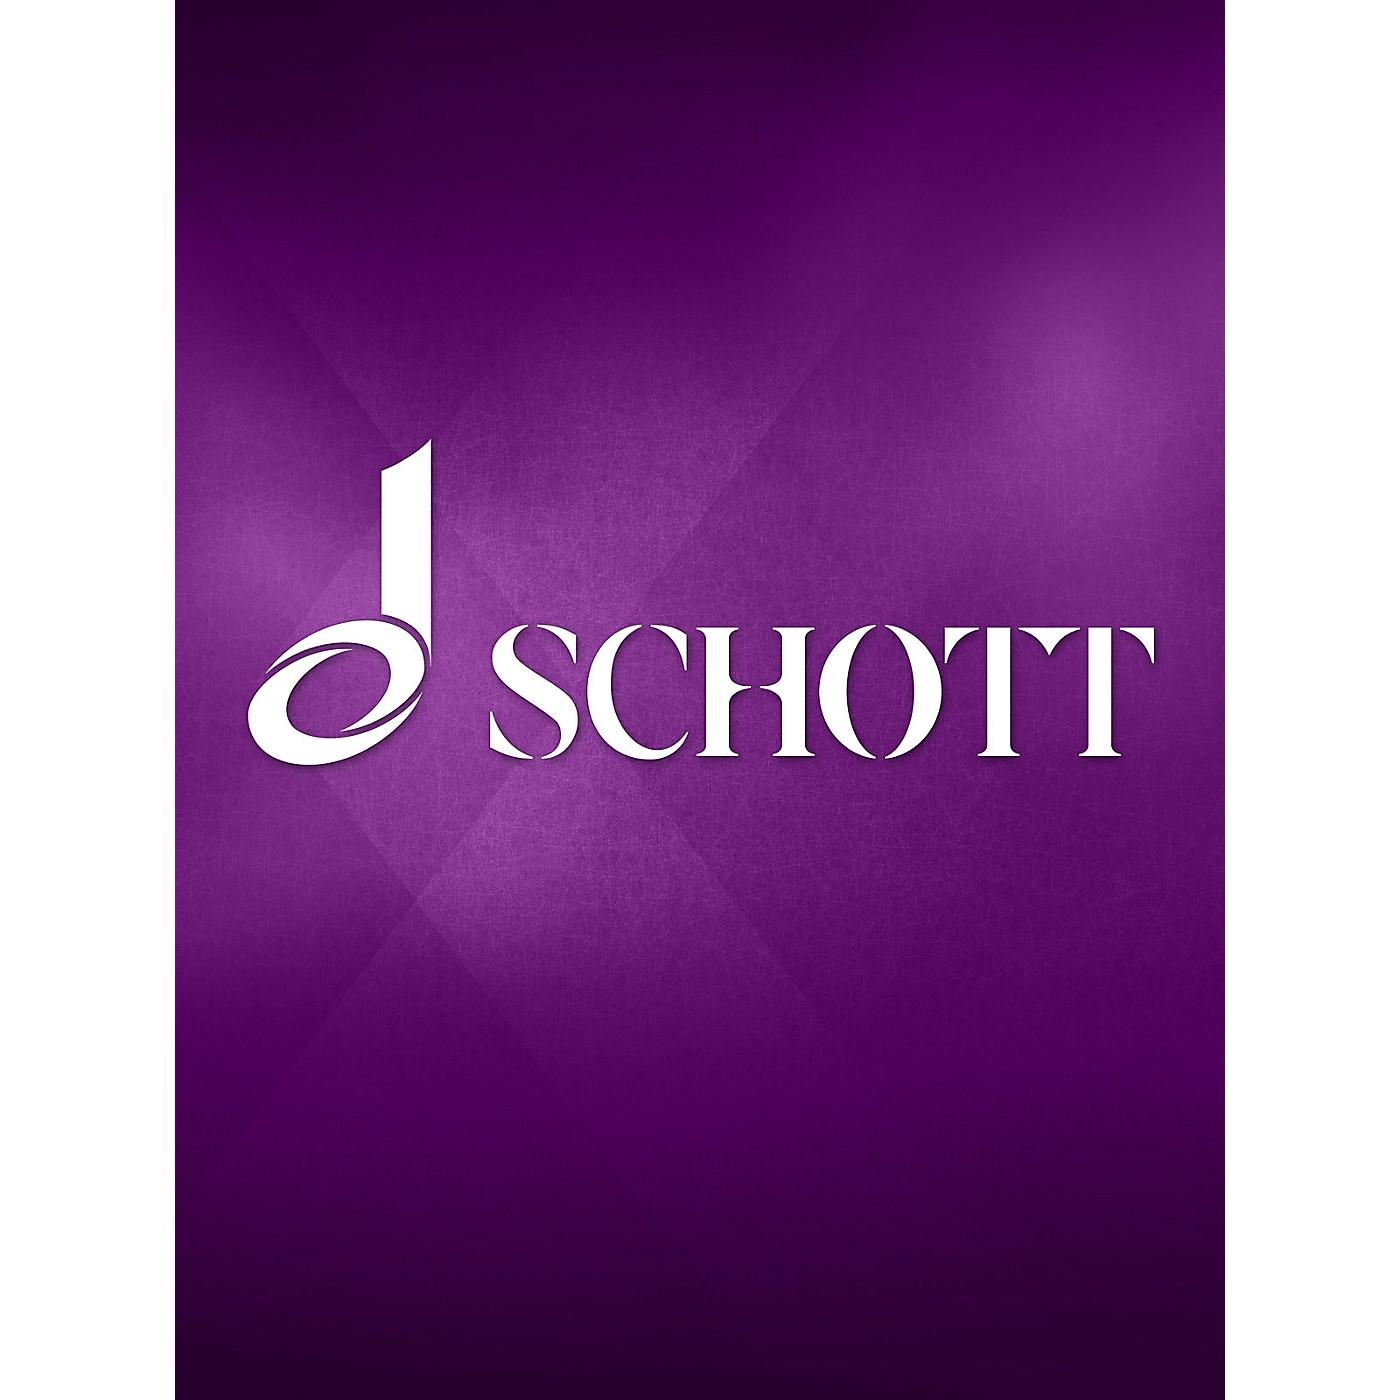 Schott More Tunes for My Recorder (Soprano & Alto Recorder/Teacher Edition) Schott Series thumbnail